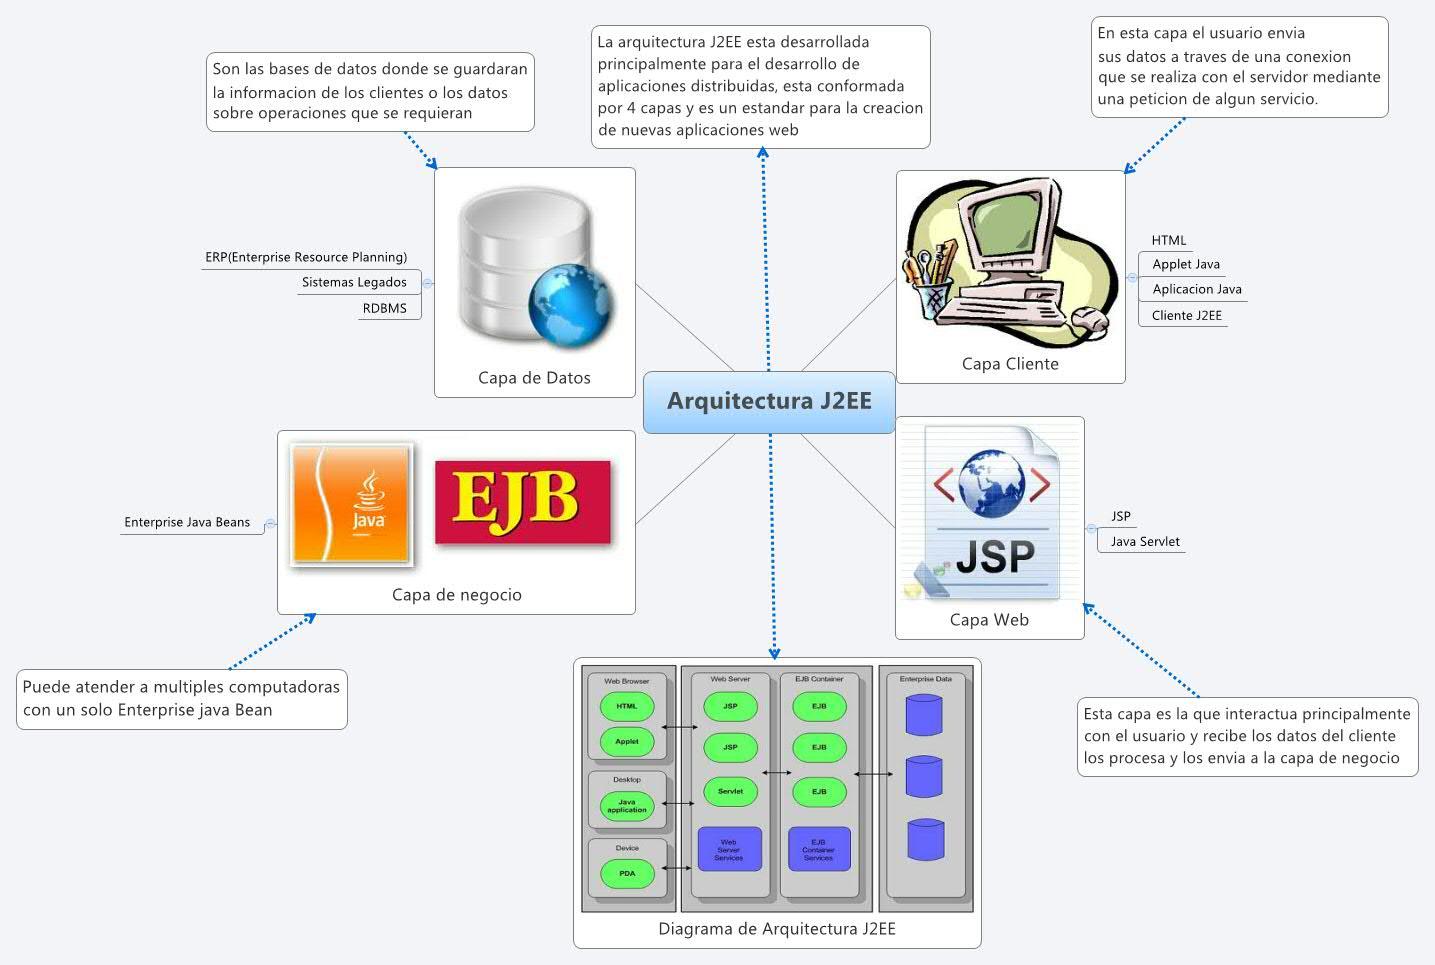 arquitectura j2ee xmind online library On arquitectura j2ee